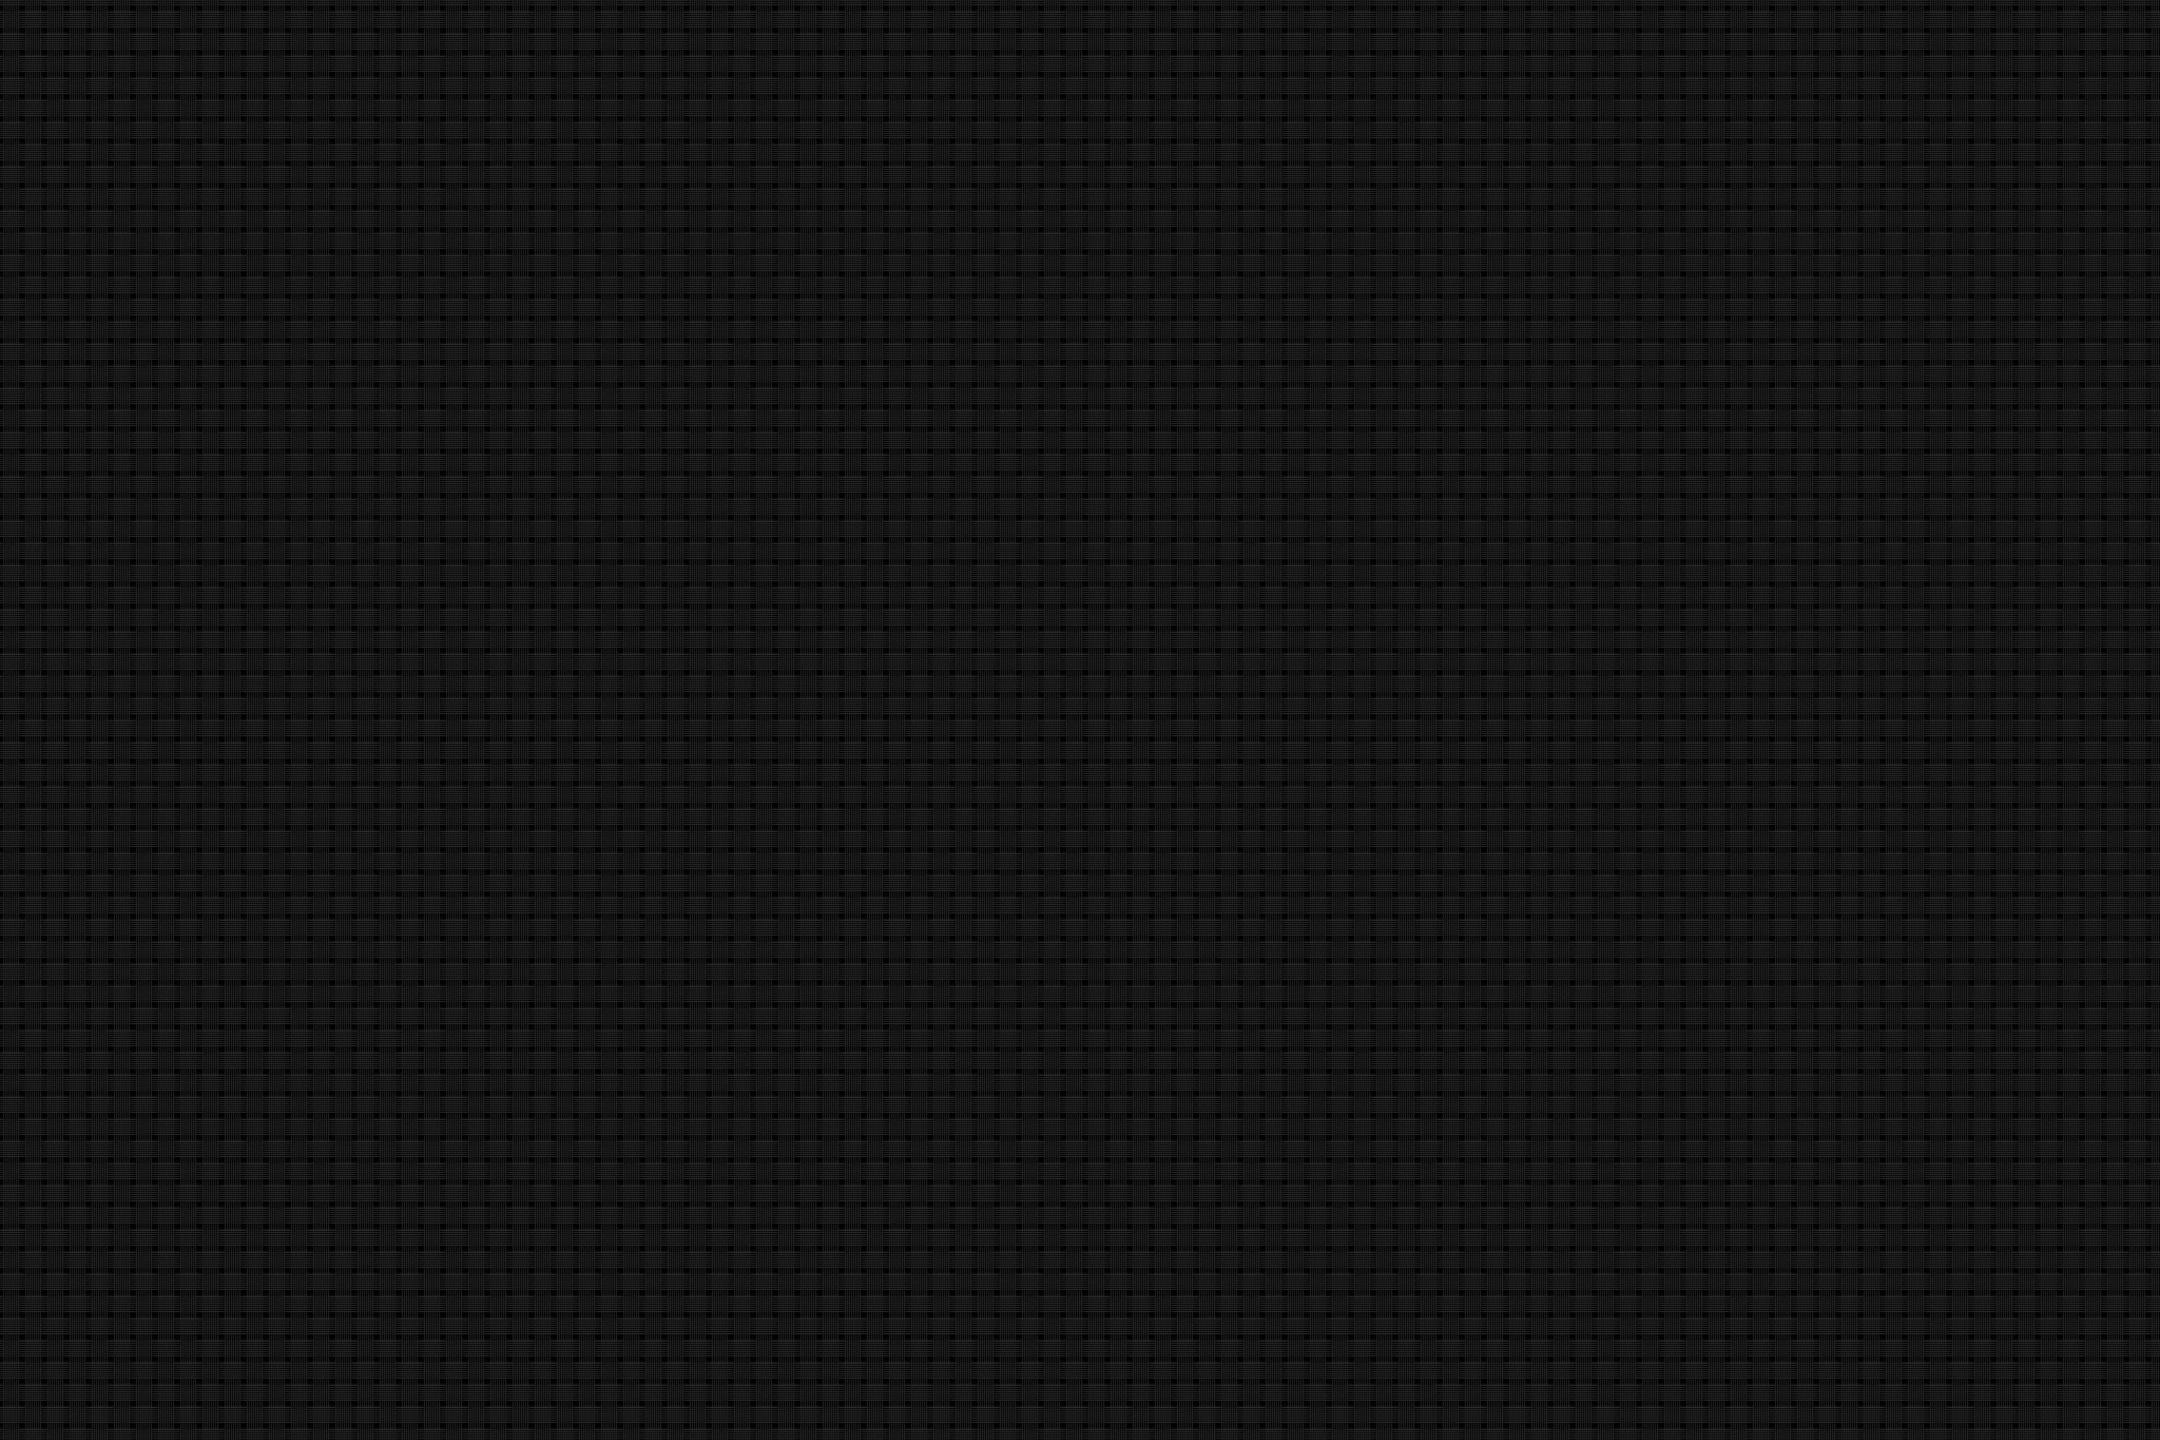 21601440 Wallpaper 00637 PCnet 2160x1440